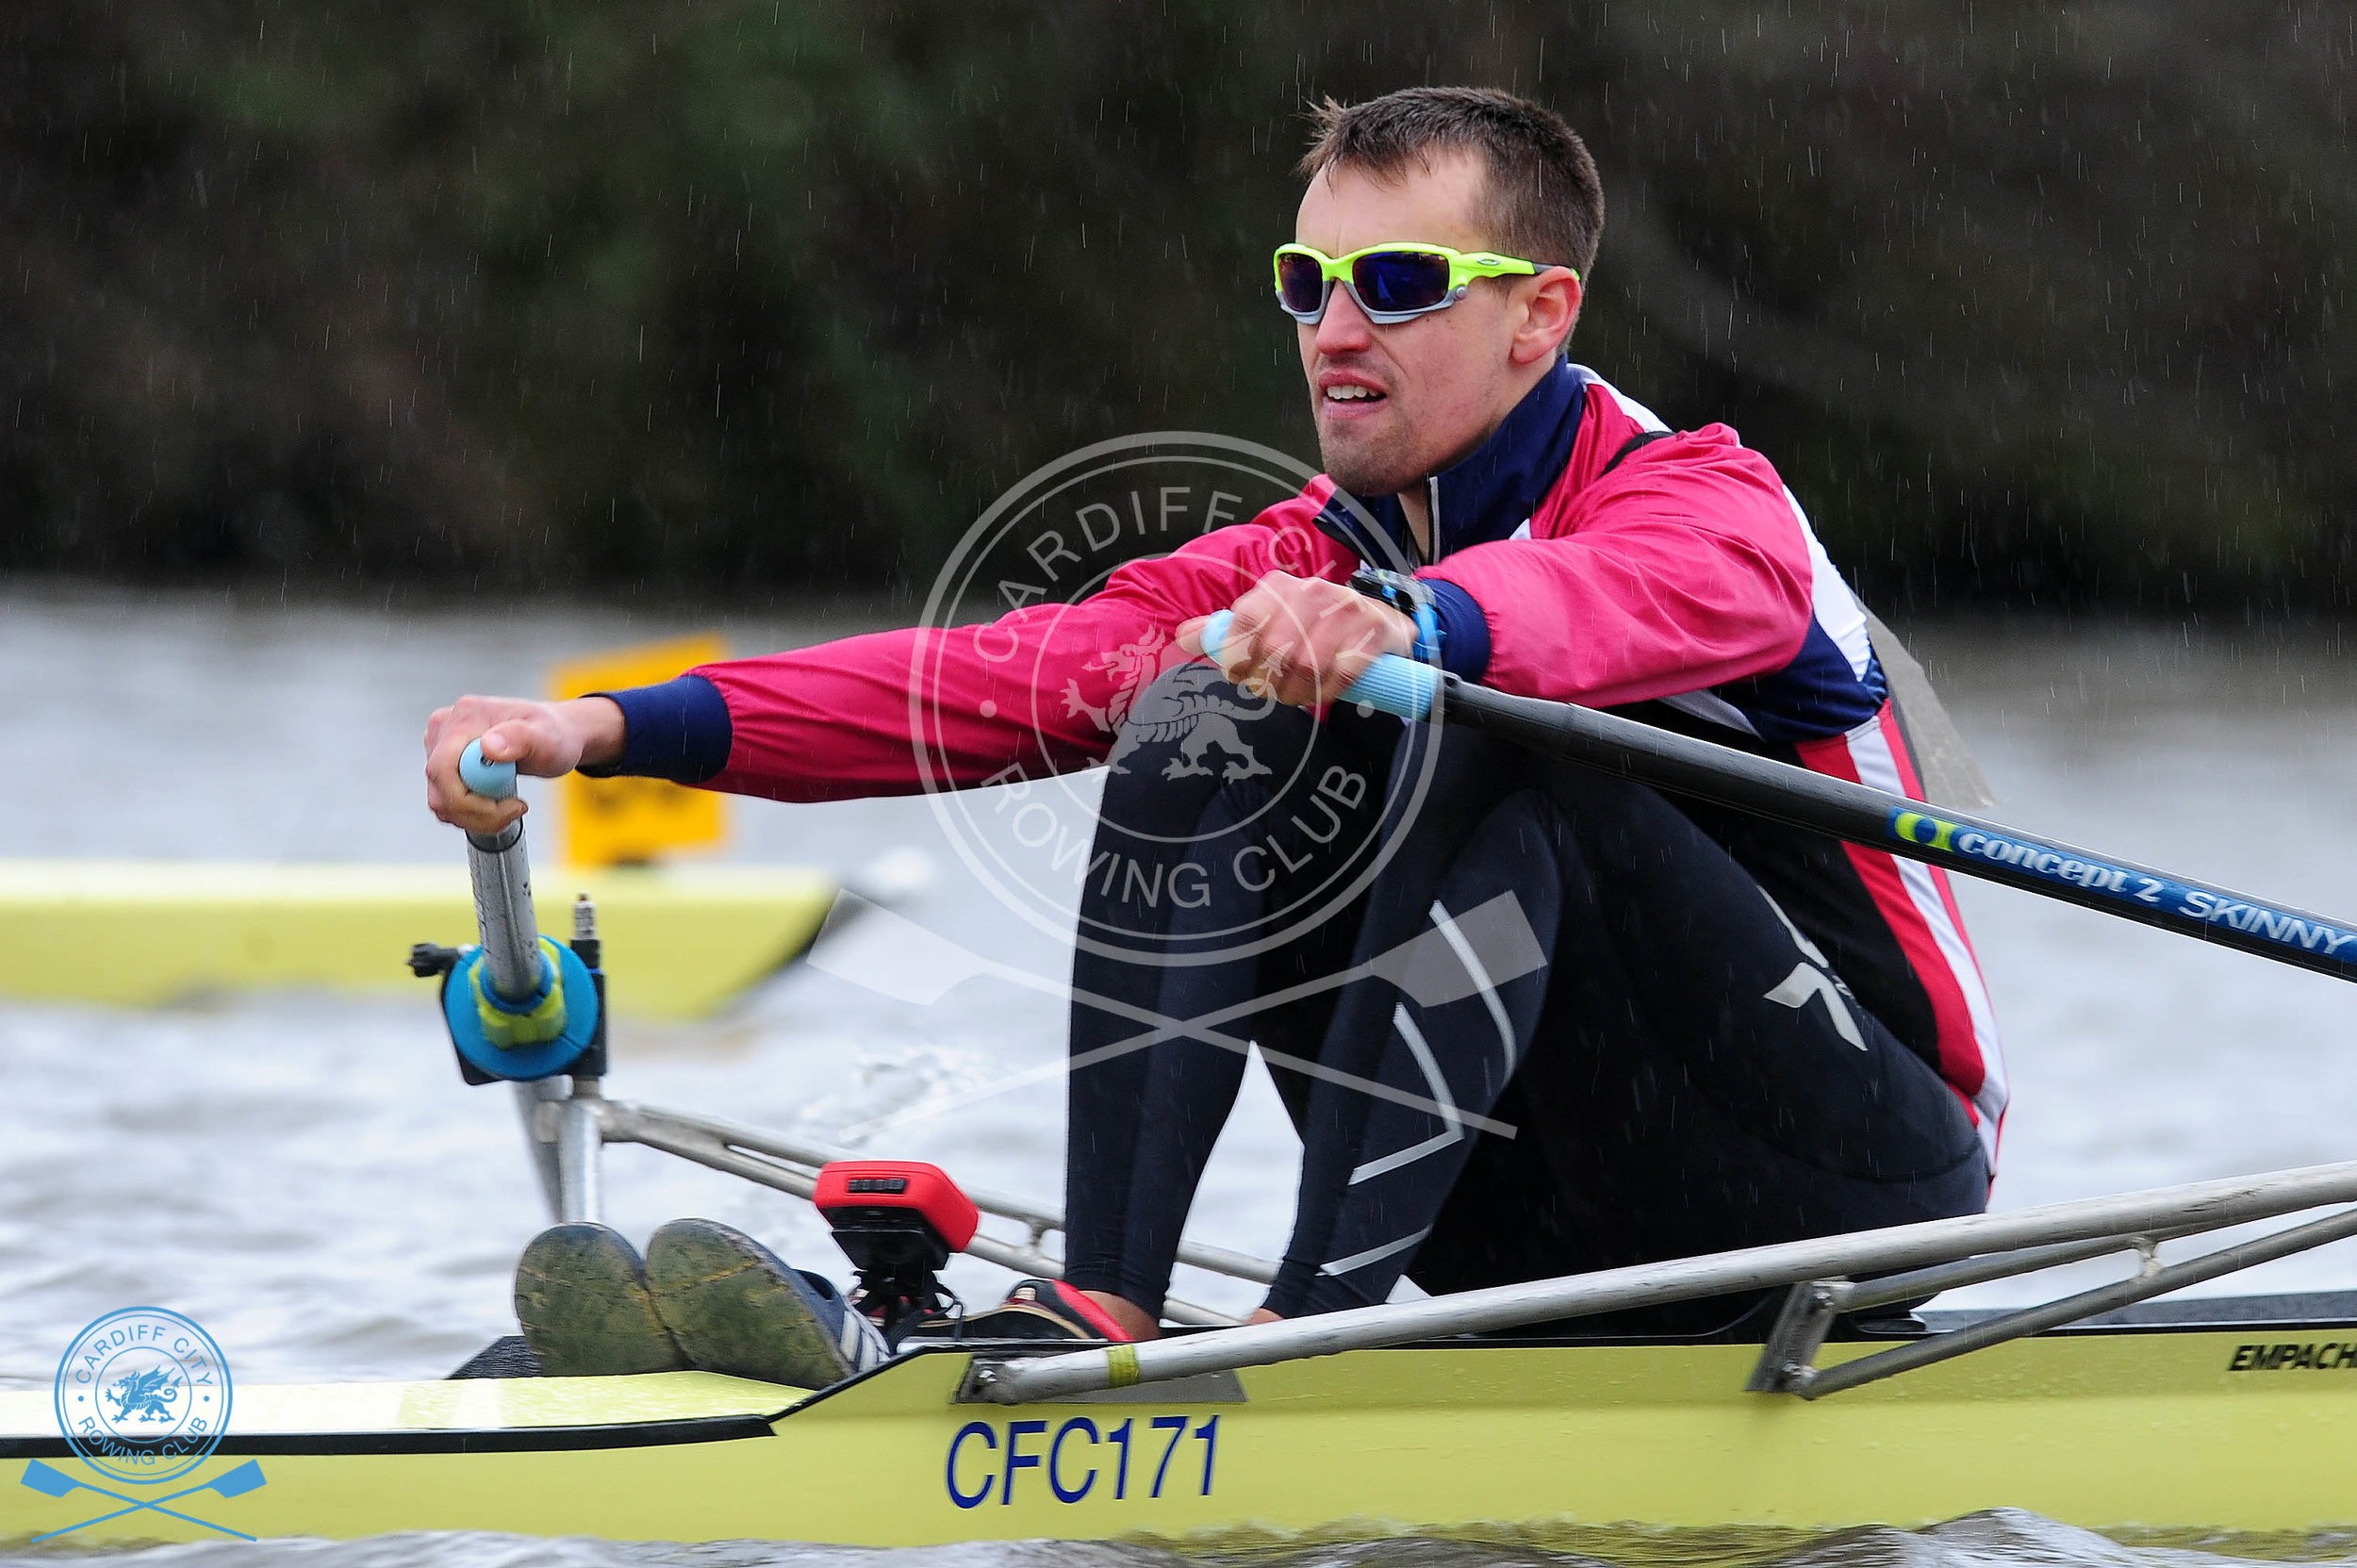 DW_280119_Cardiff_City_Rowing_283.jpg